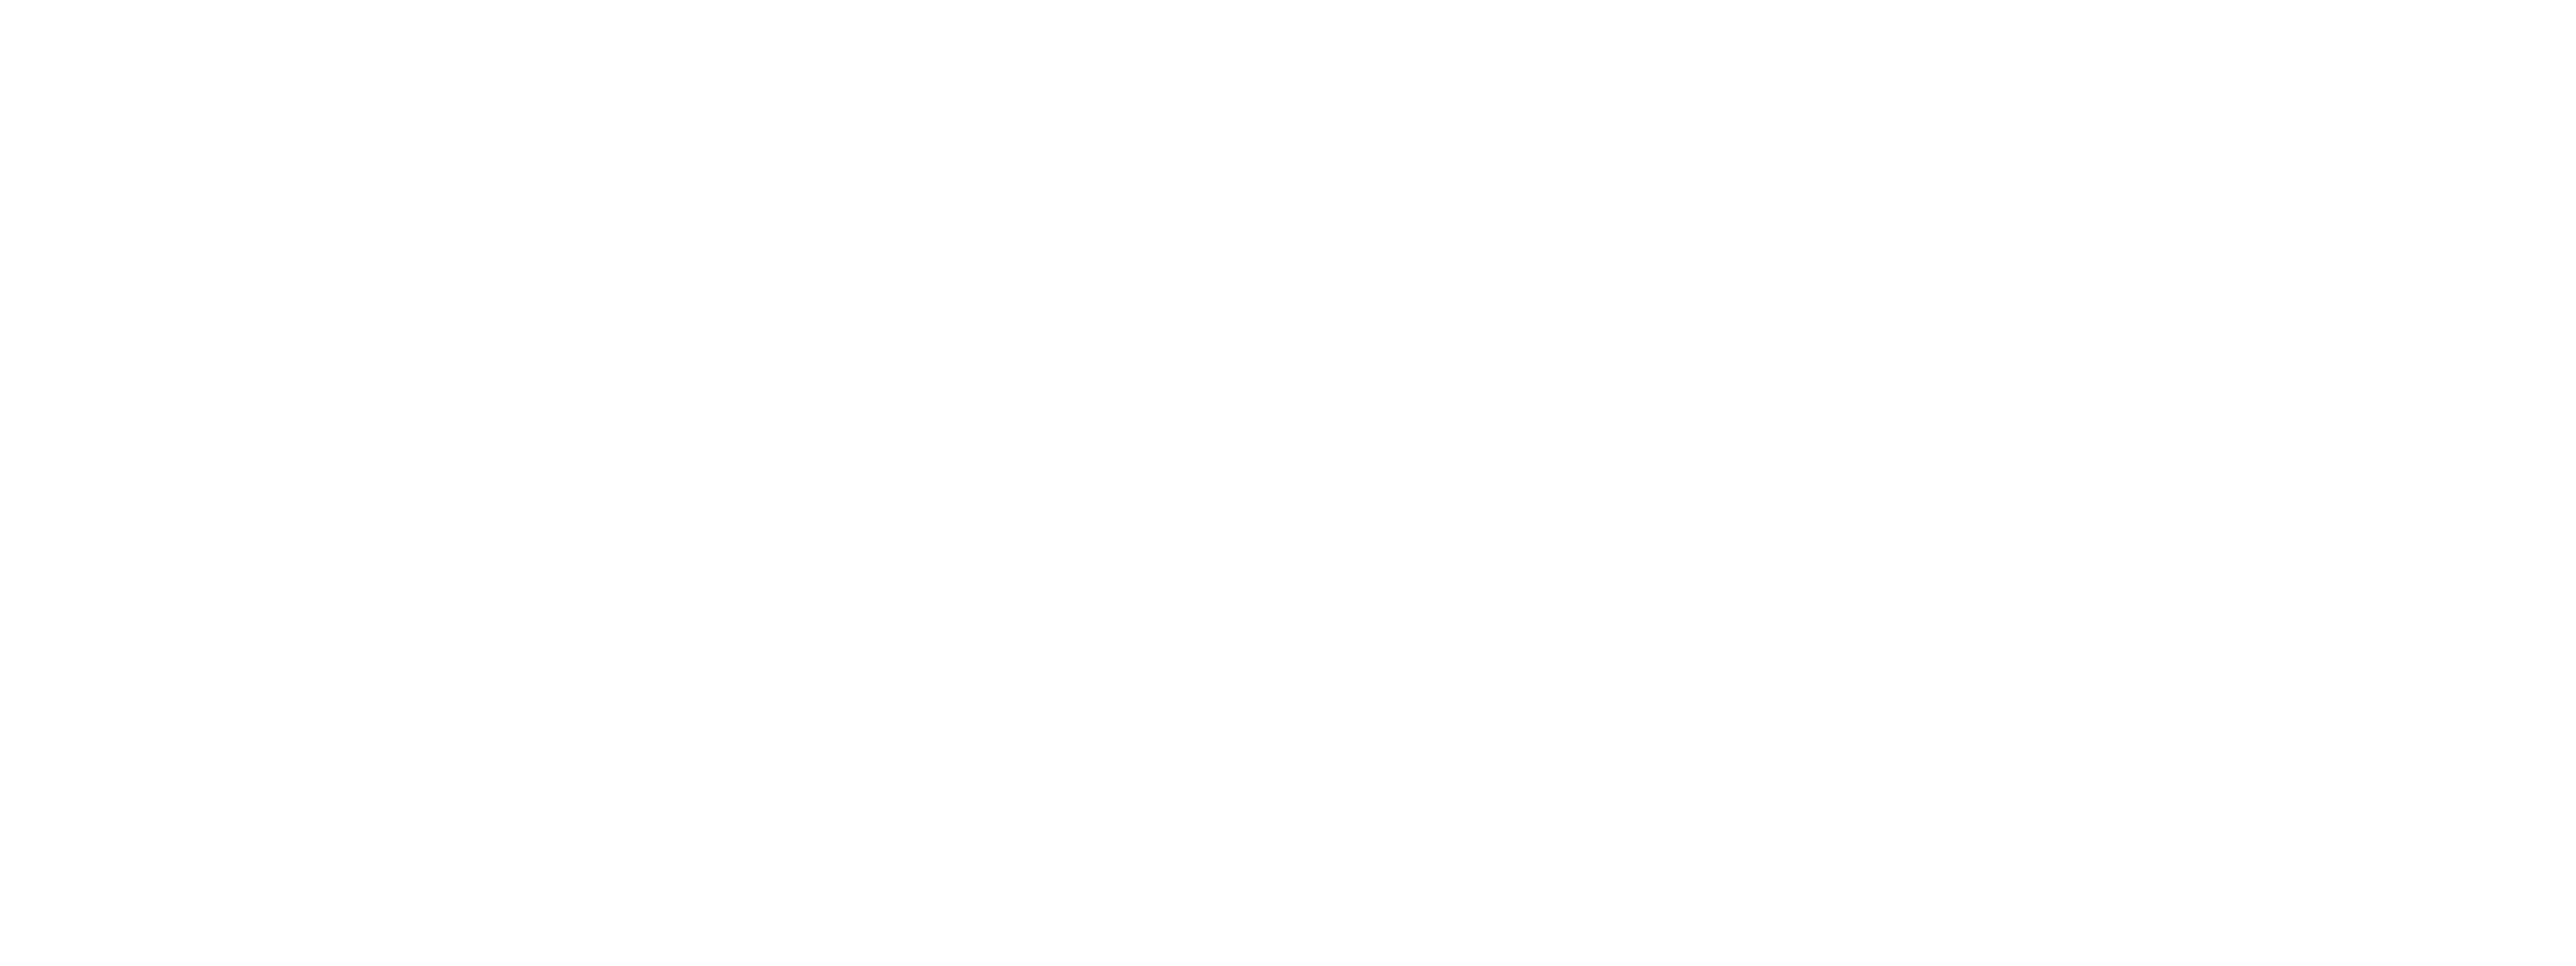 Ebs Paris Alumni logo